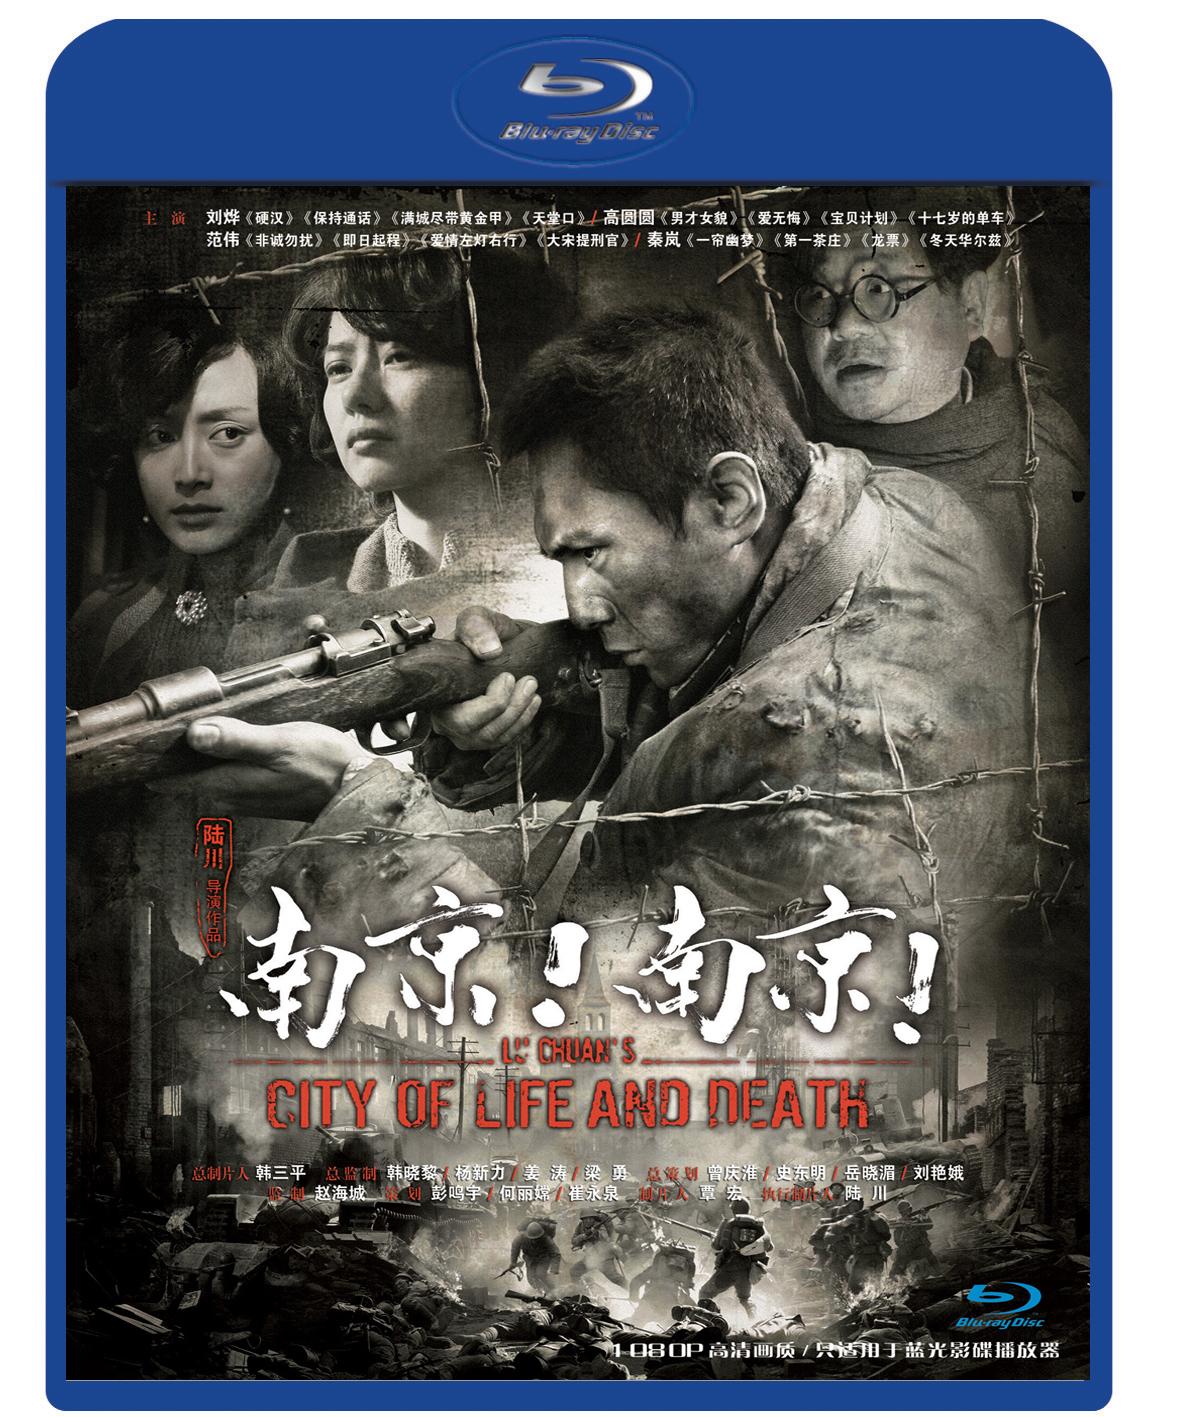 南京!南京! 國粵雙語 原盤繁簡英SUP字幕 City of Life and Death 2009 BluRay 1080p 2Audio TrueHD 5.1 x265.10bit-BeiTai